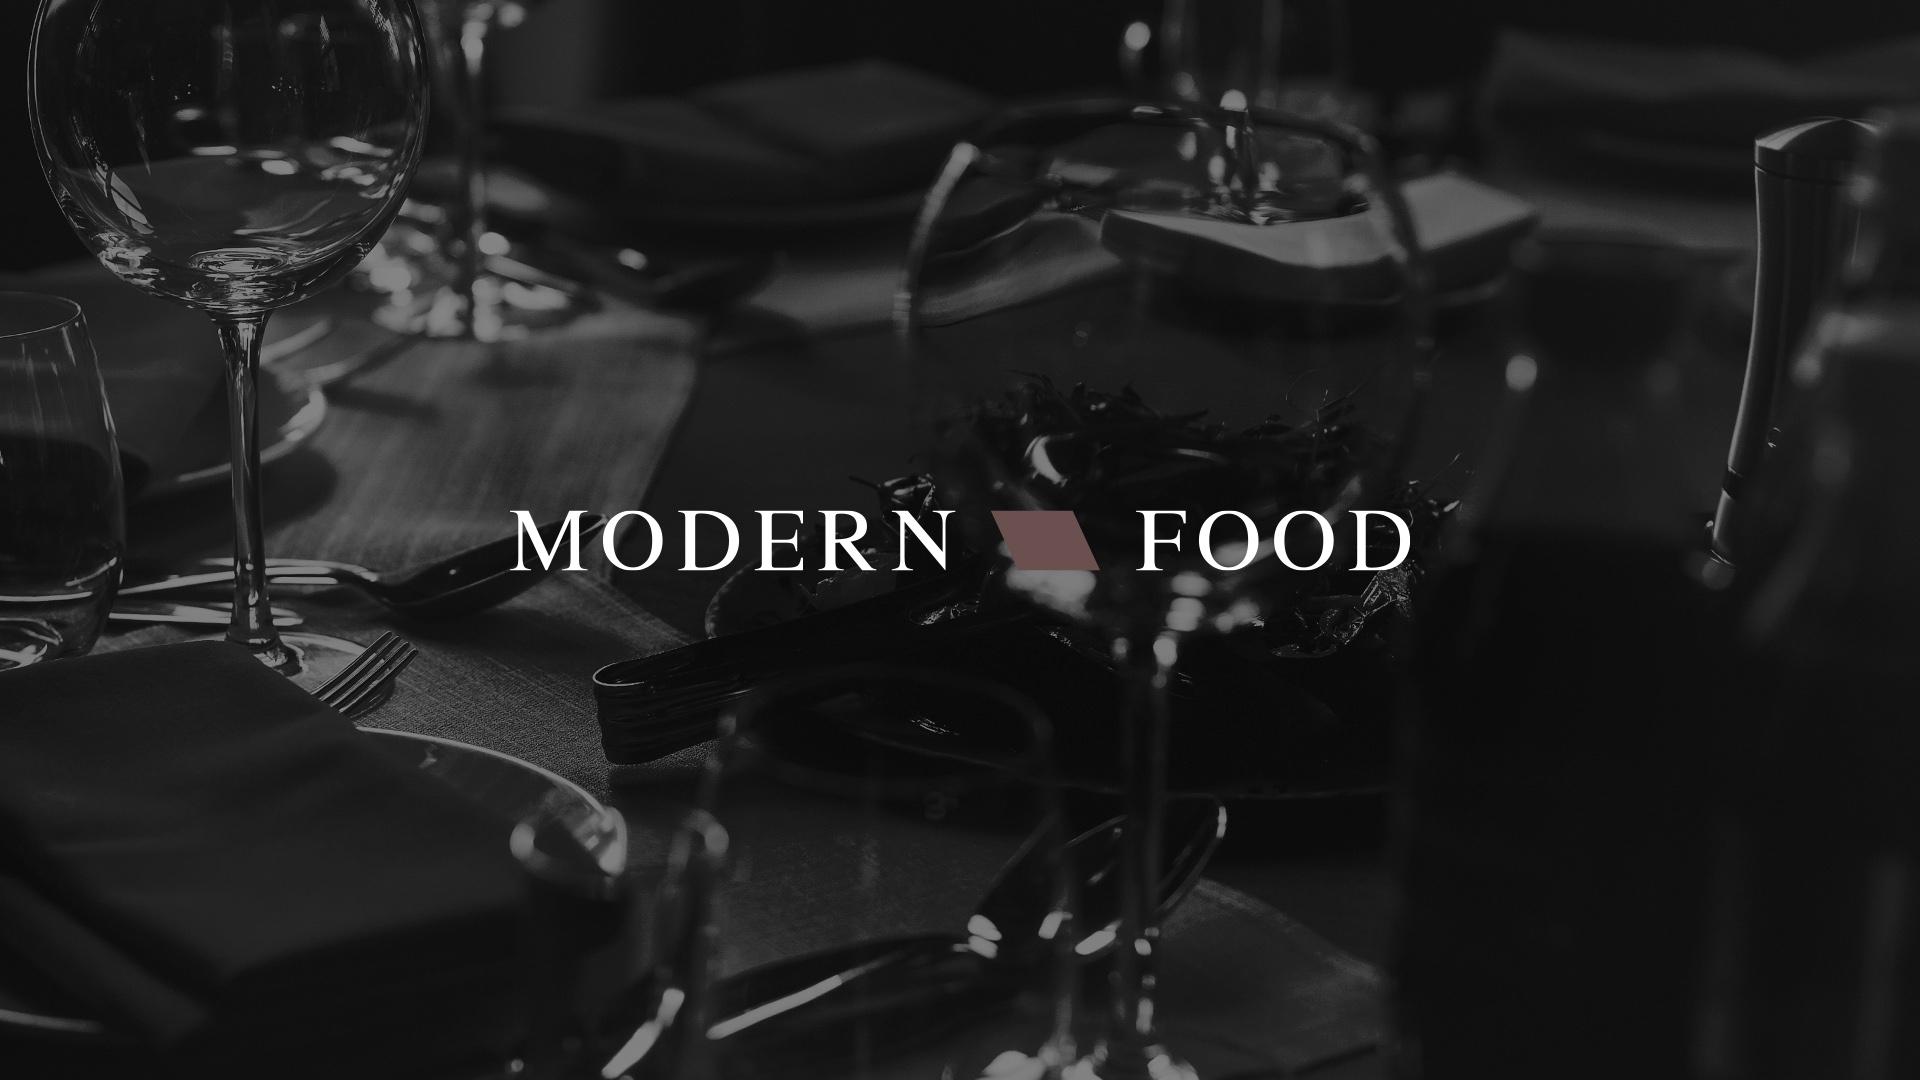 10-ModernFood_By_Storm_Design_Studio